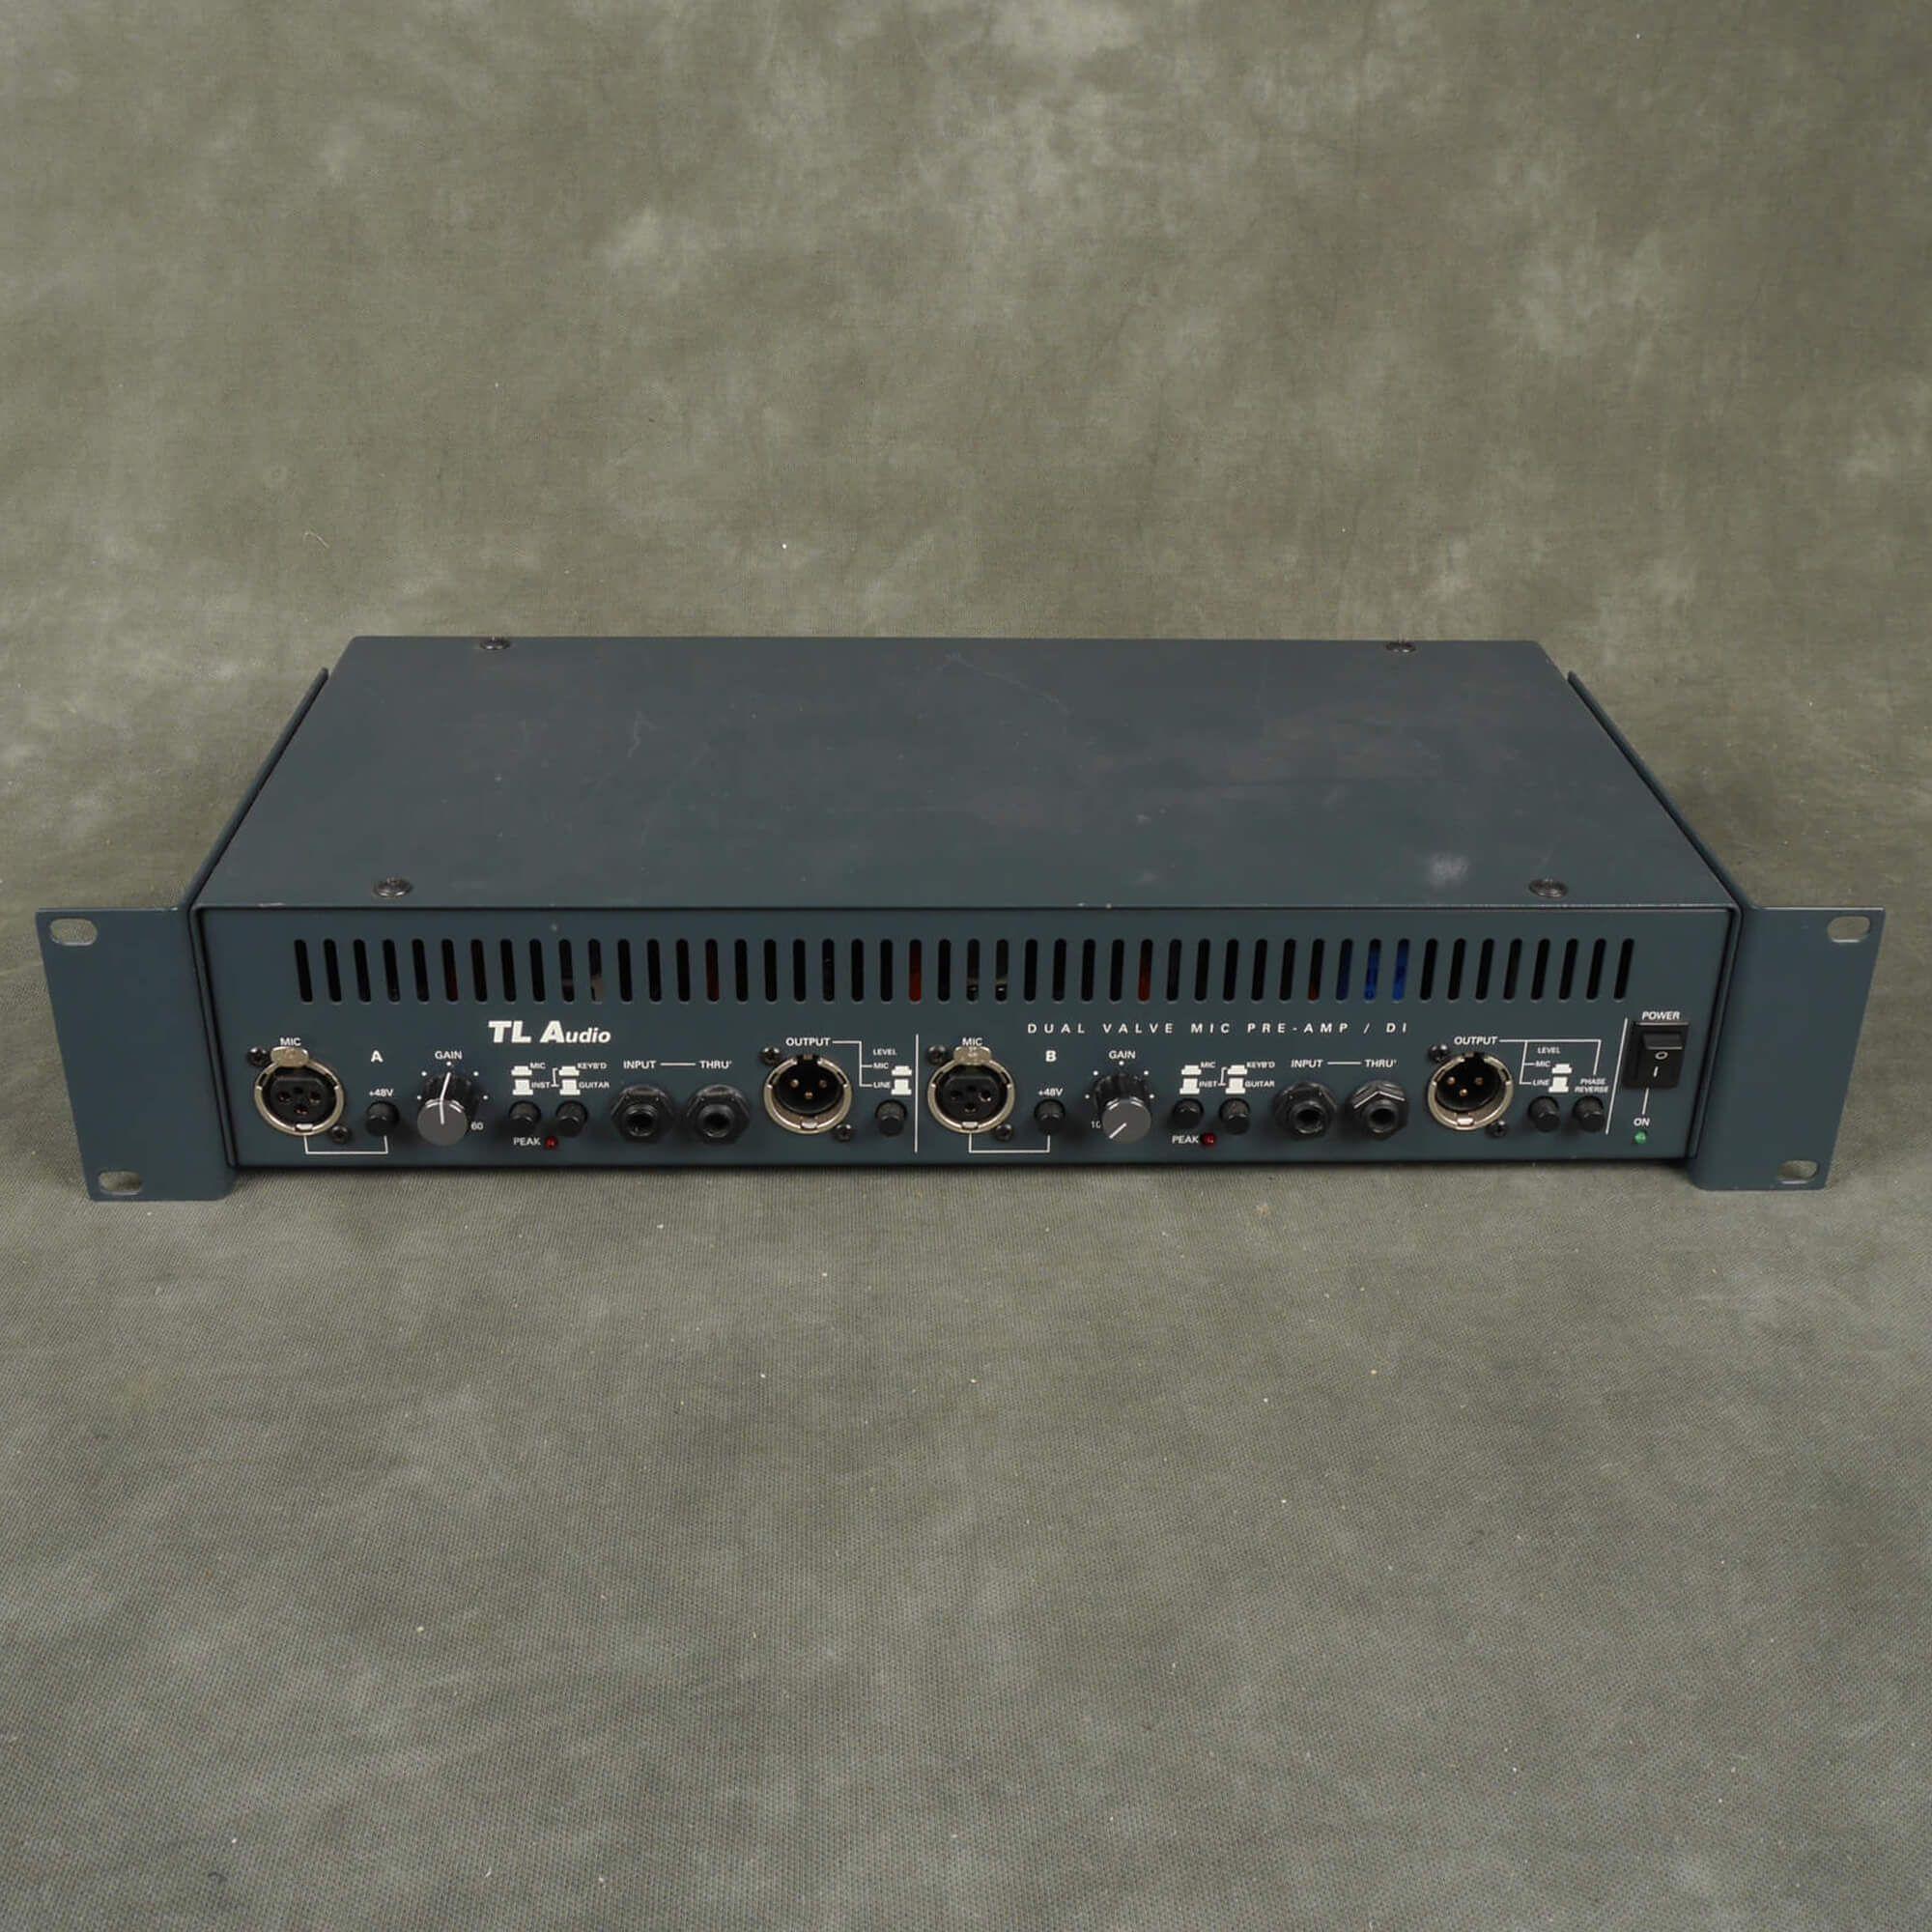 TL Audio Dual Valve Mic Pre Amp/DI - 2nd Hand